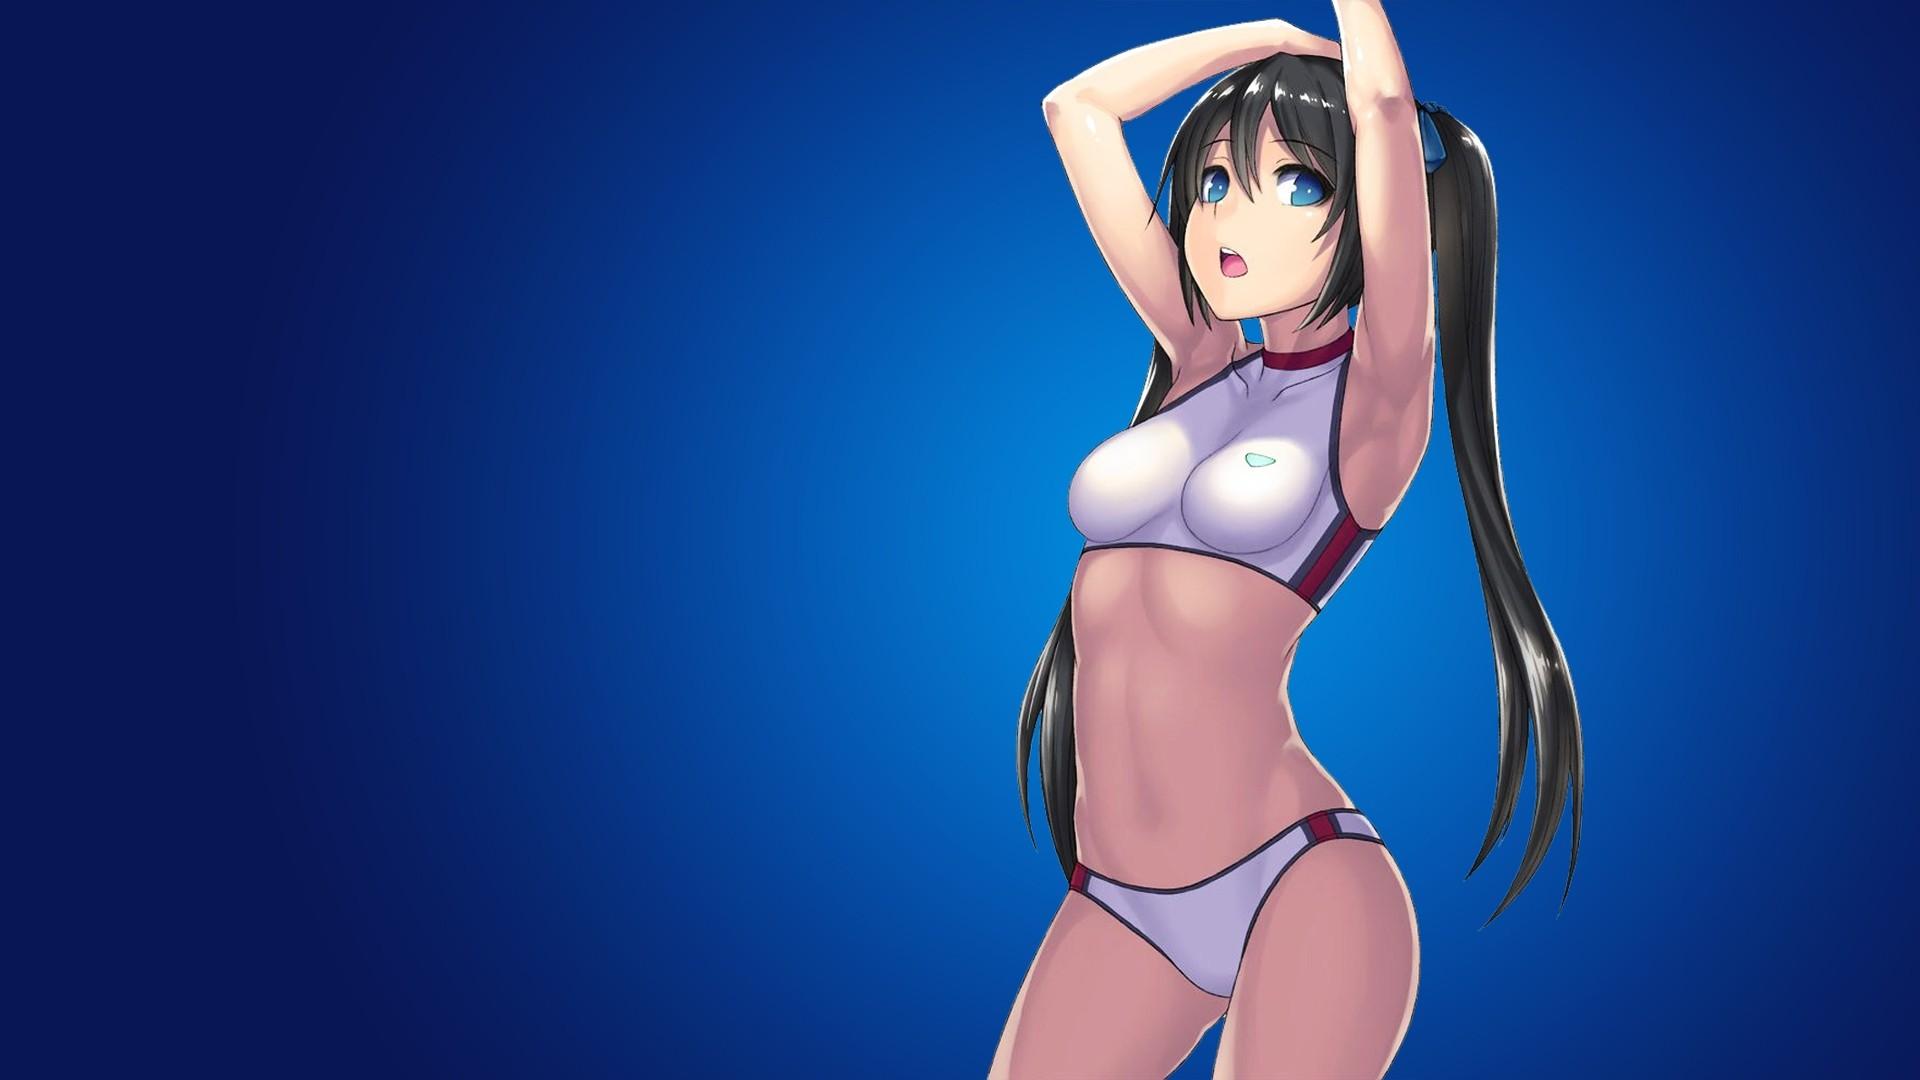 Anime Ecchi full screen hd wallpaper